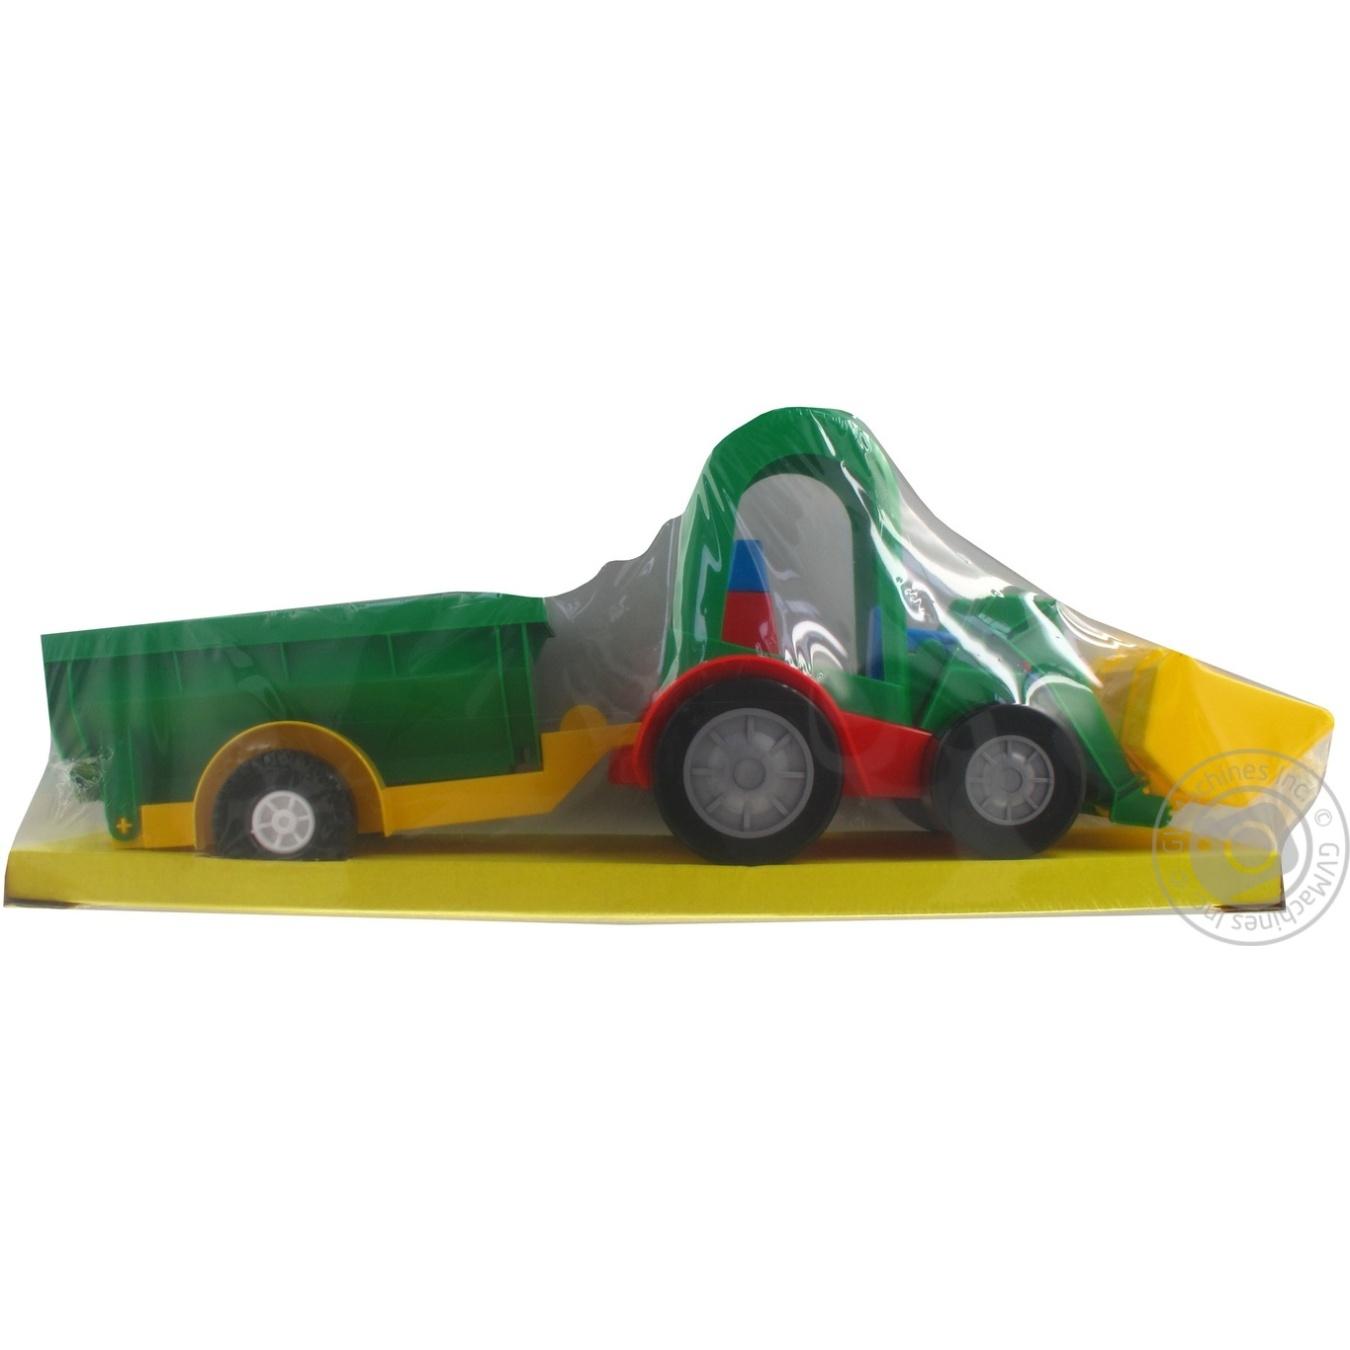 Игрушка трактор-багги с ковшом и прицепом